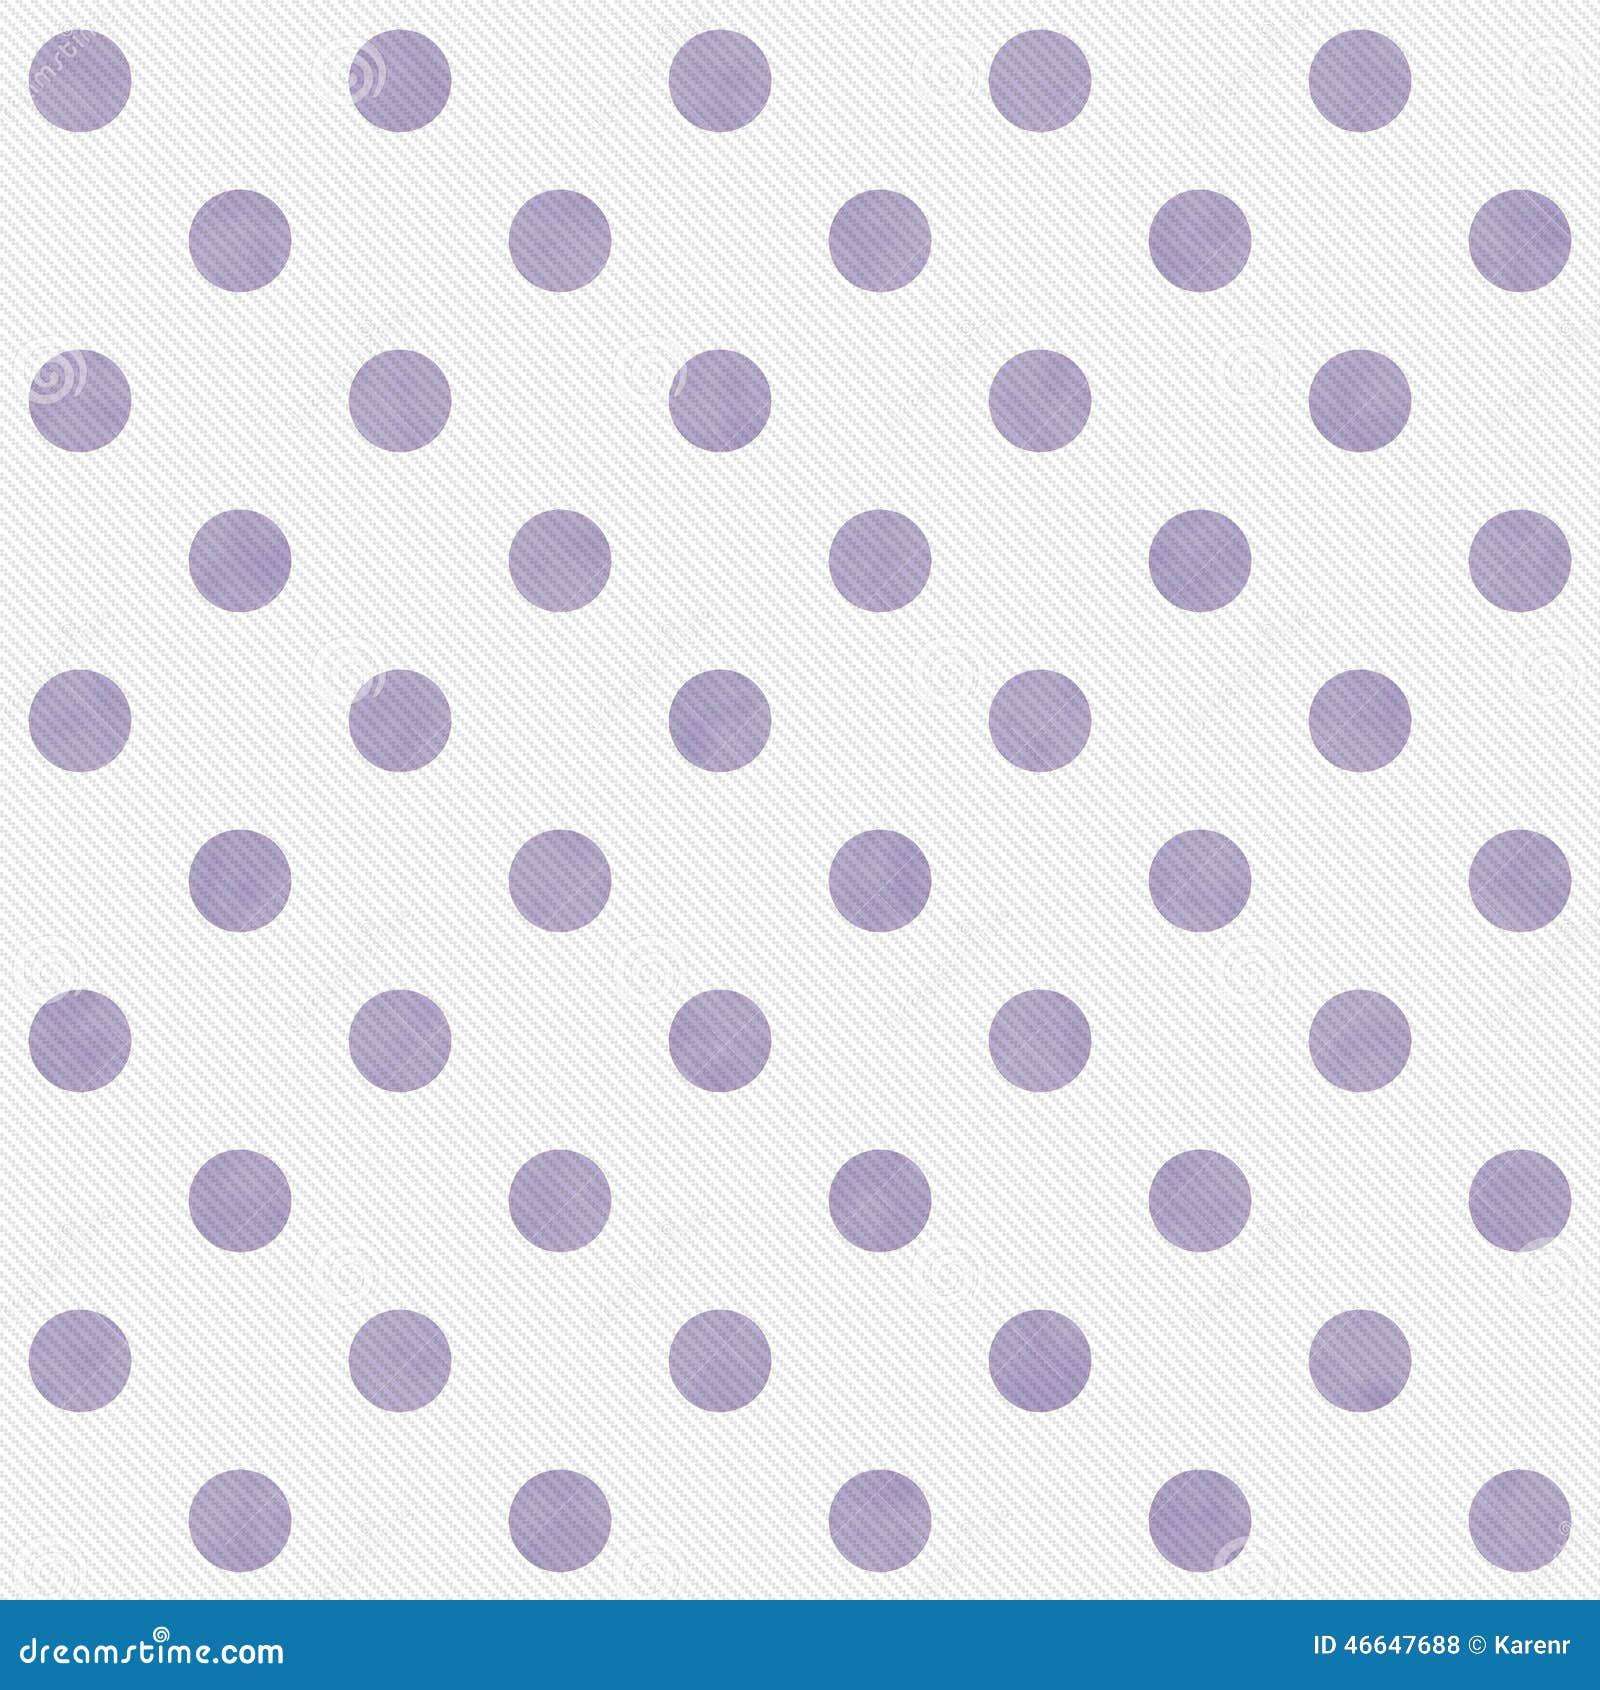 Purpere en Witte Grote Polka Dots Pattern Repeat Background